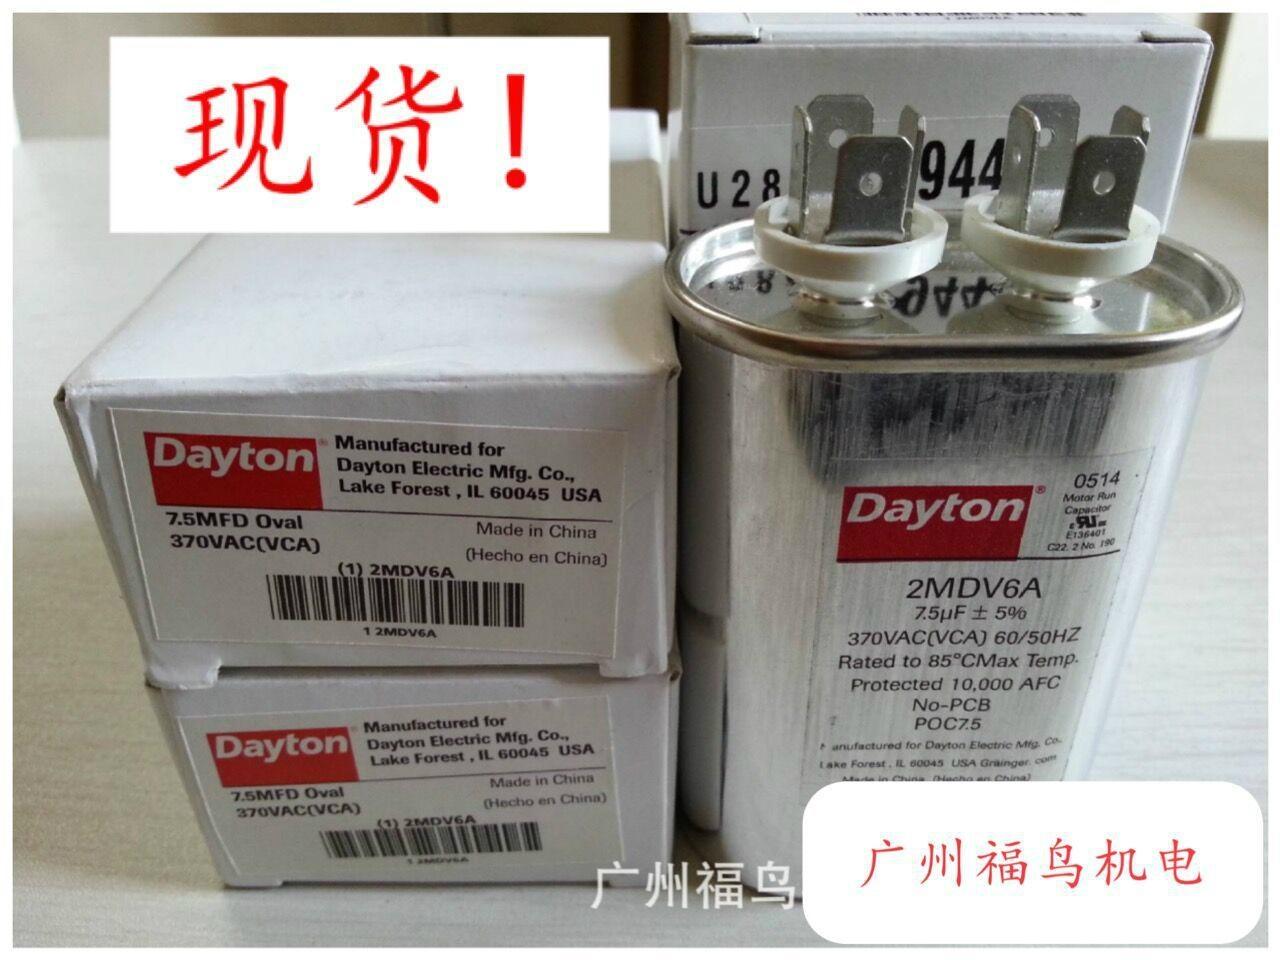 DAYTON电容, 型号: 2MDV6